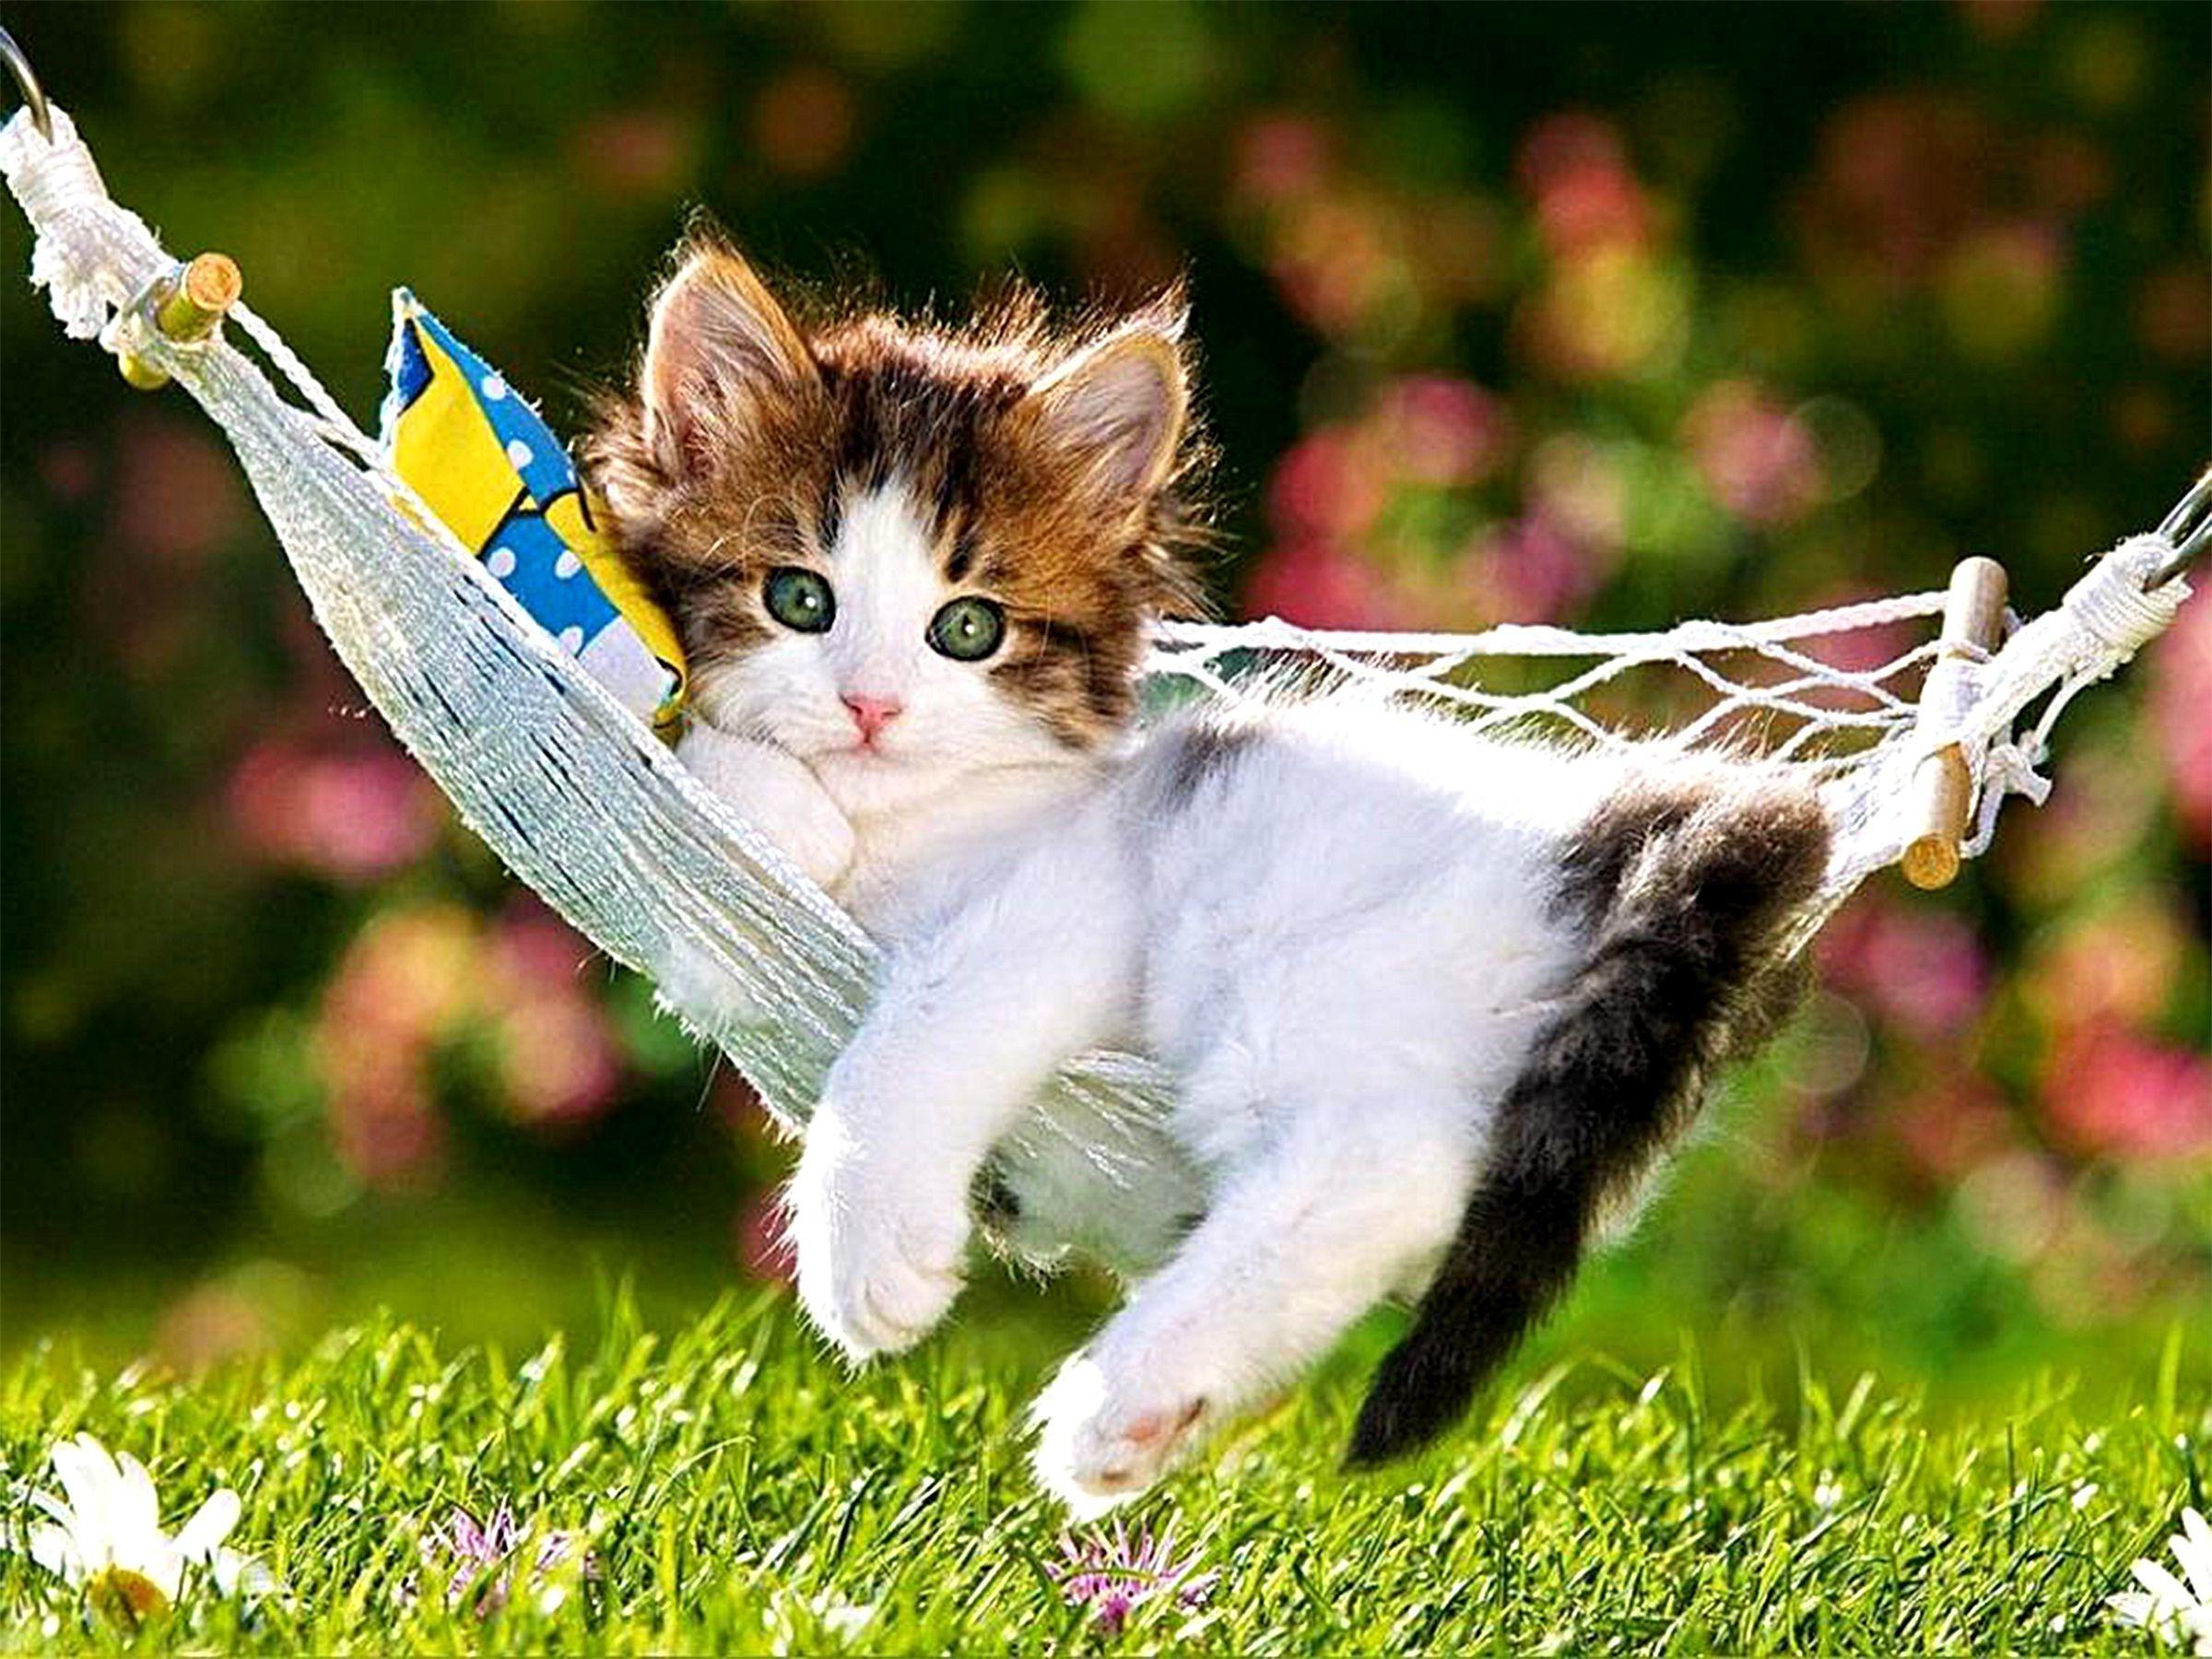 Cute kitten desktop wallpaper 60 images - Cute kitten wallpaper free download ...